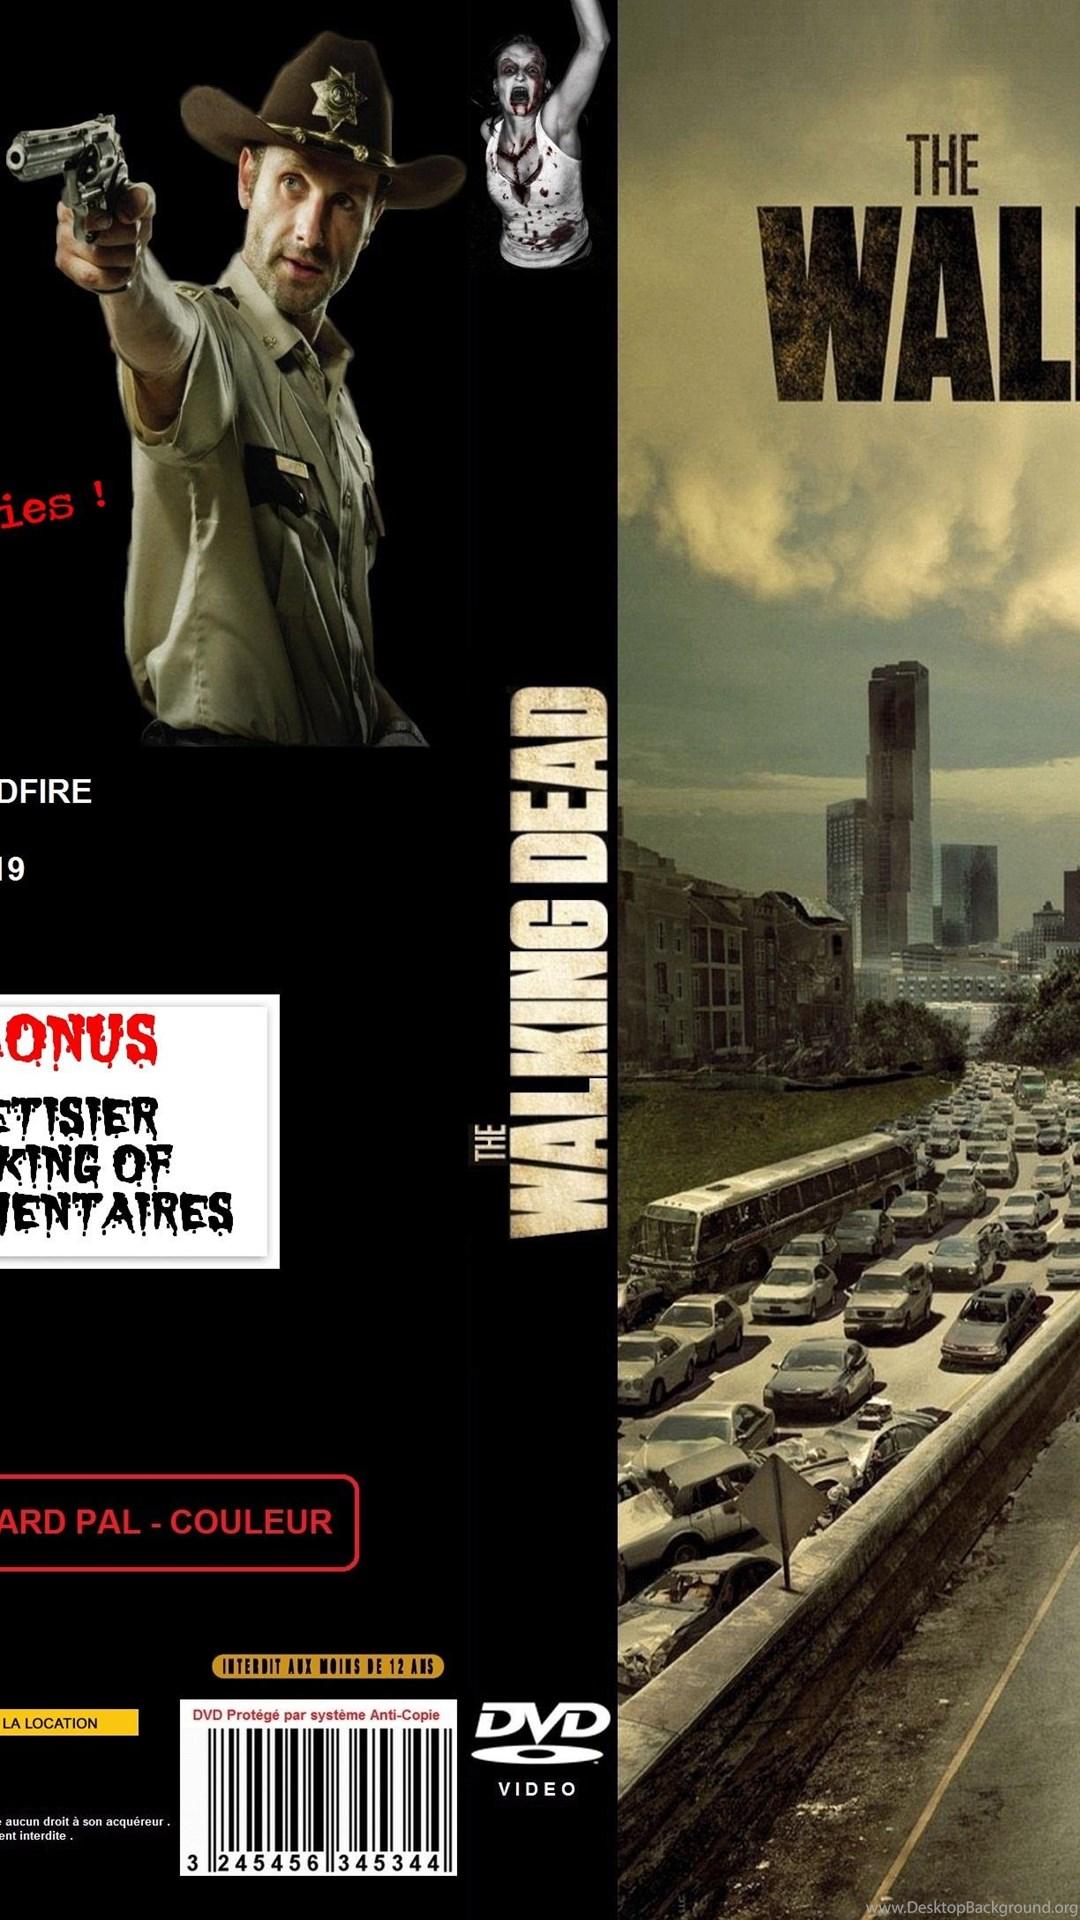 The Walking Dead Cover Wallpapers Desktop Background